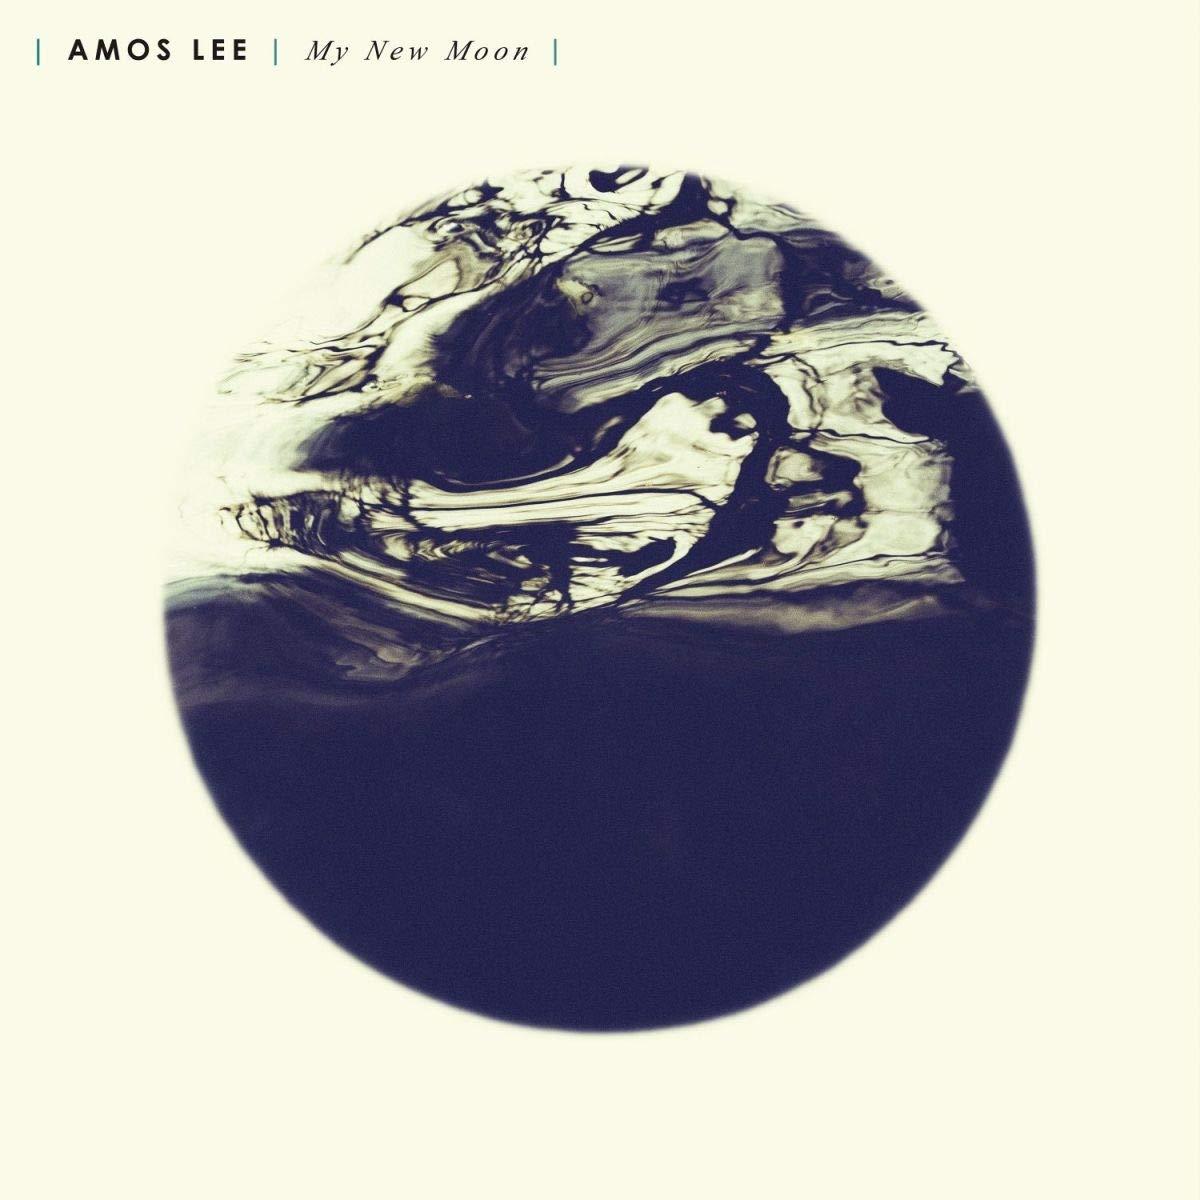 Vinilo : Amos Lee - My New Moon (LP Vinyl)